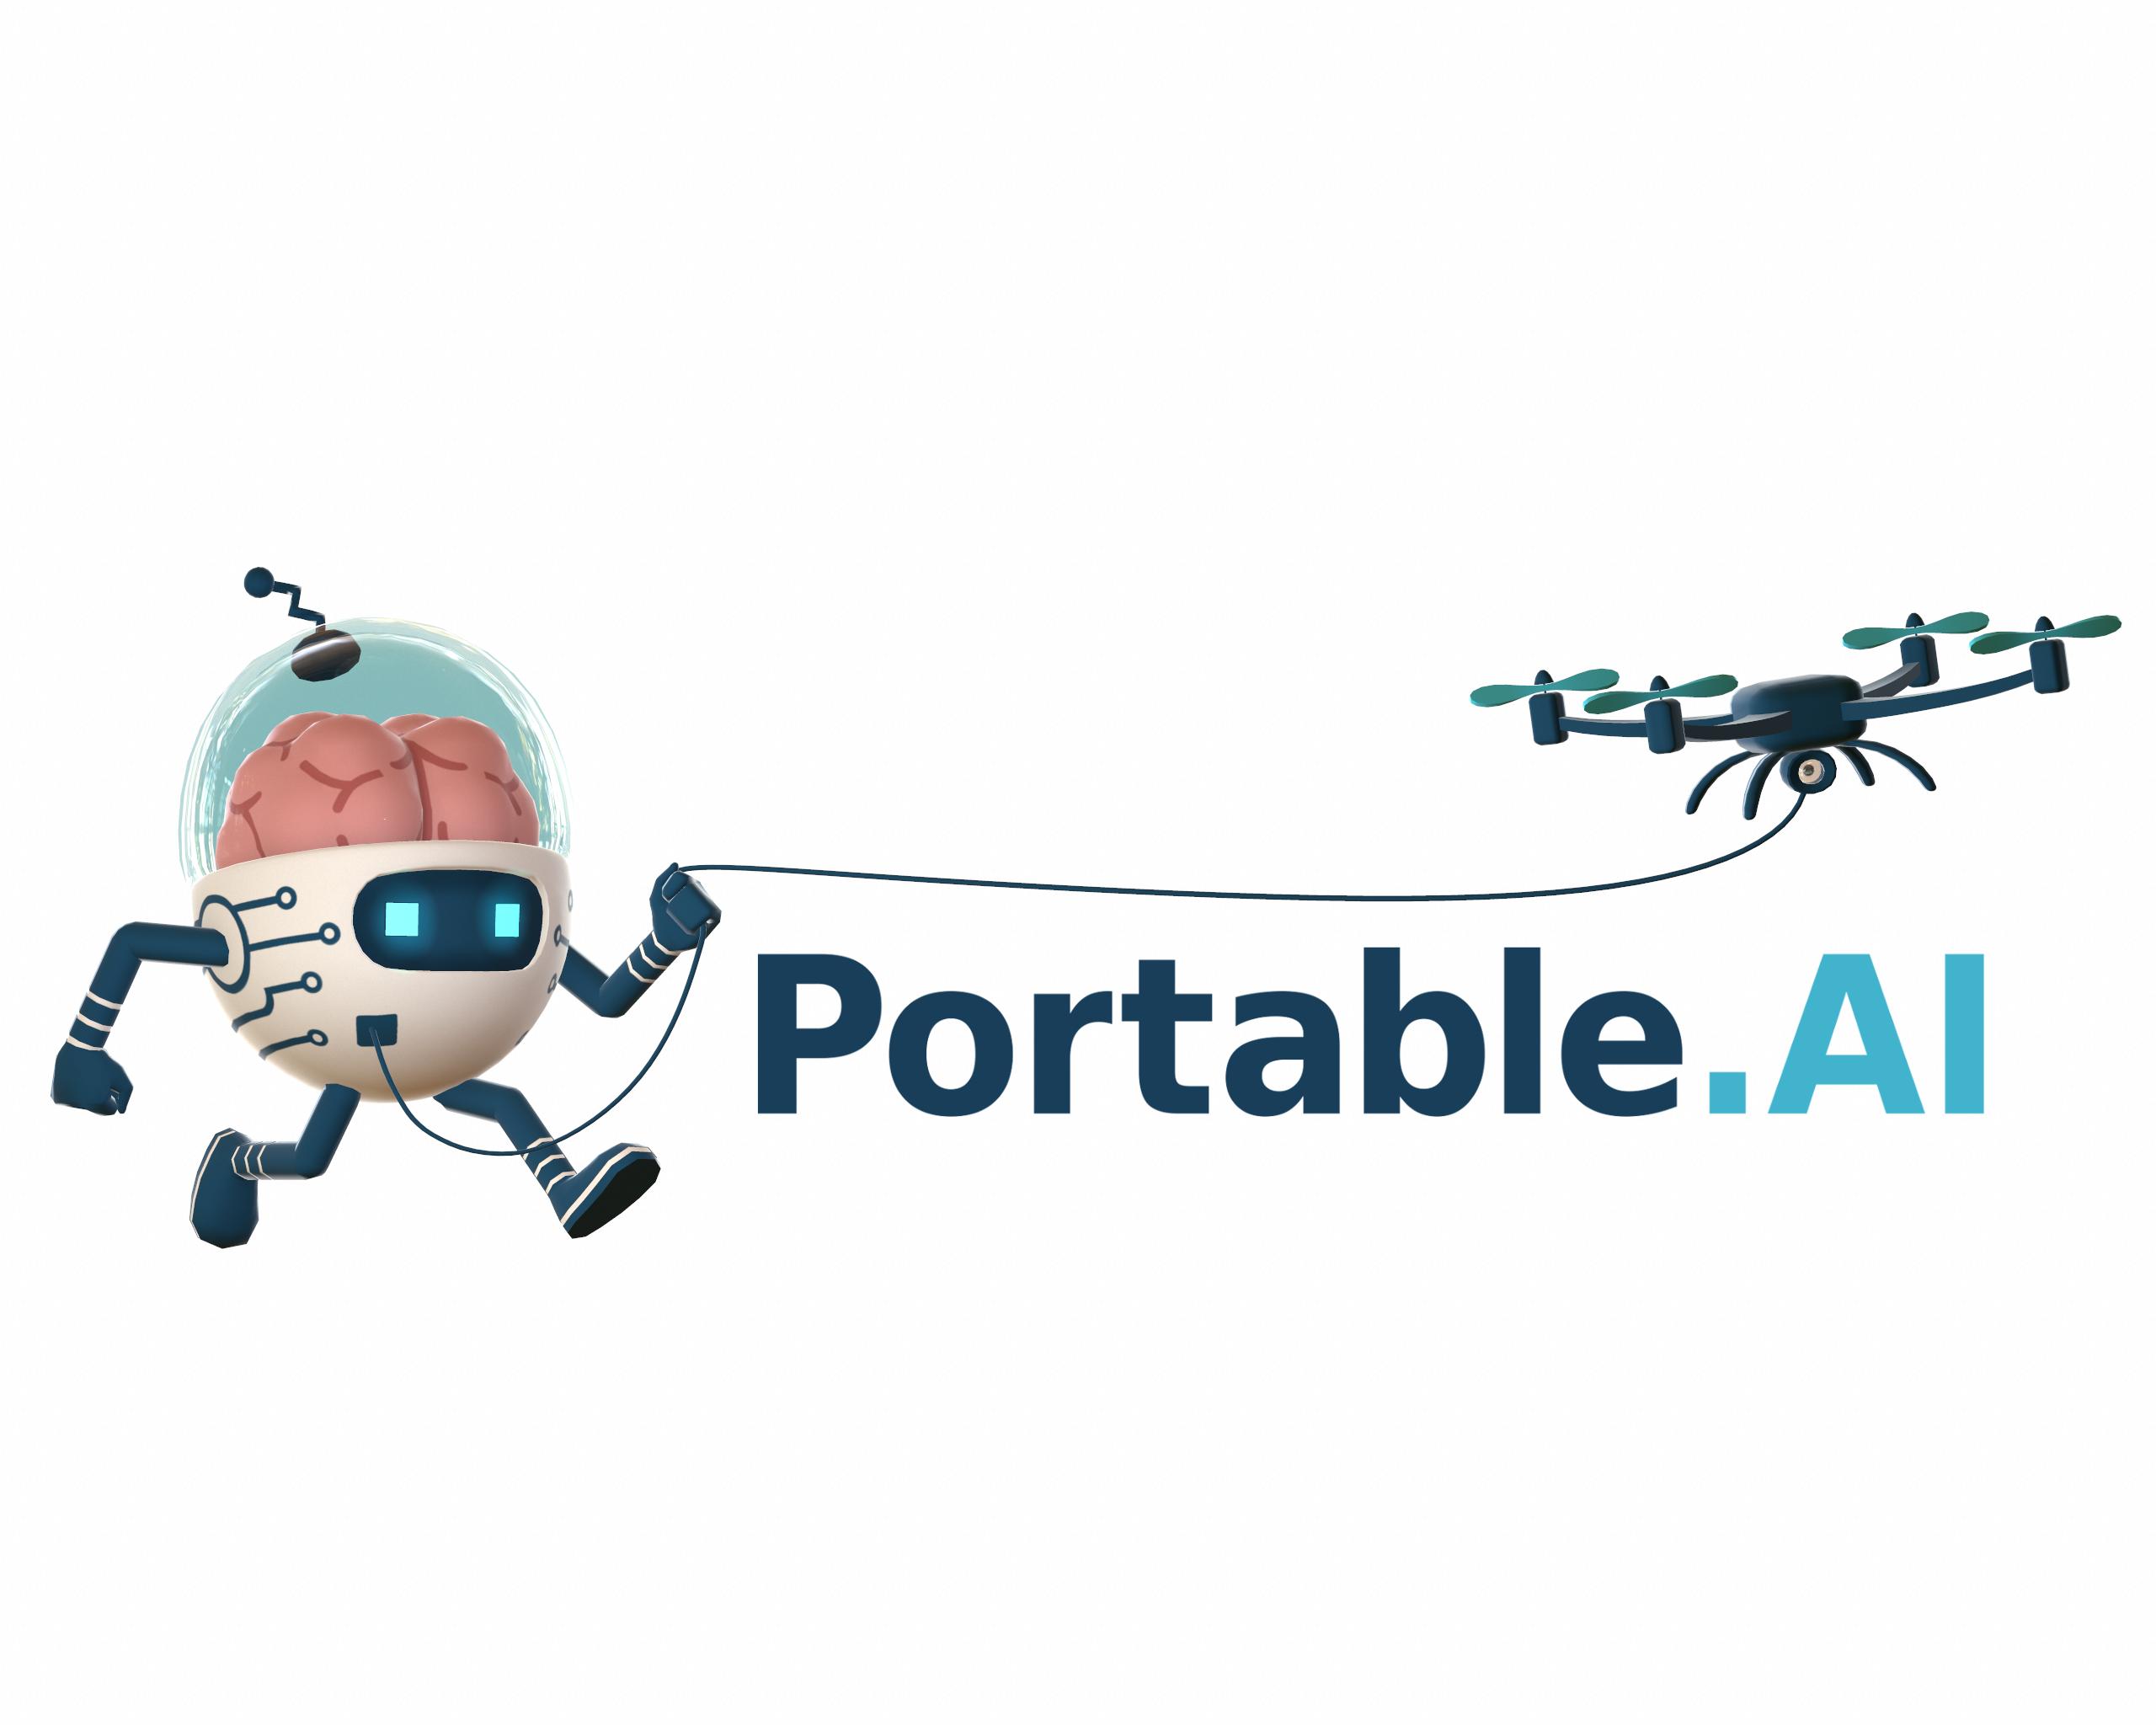 Portable.AI Mascot